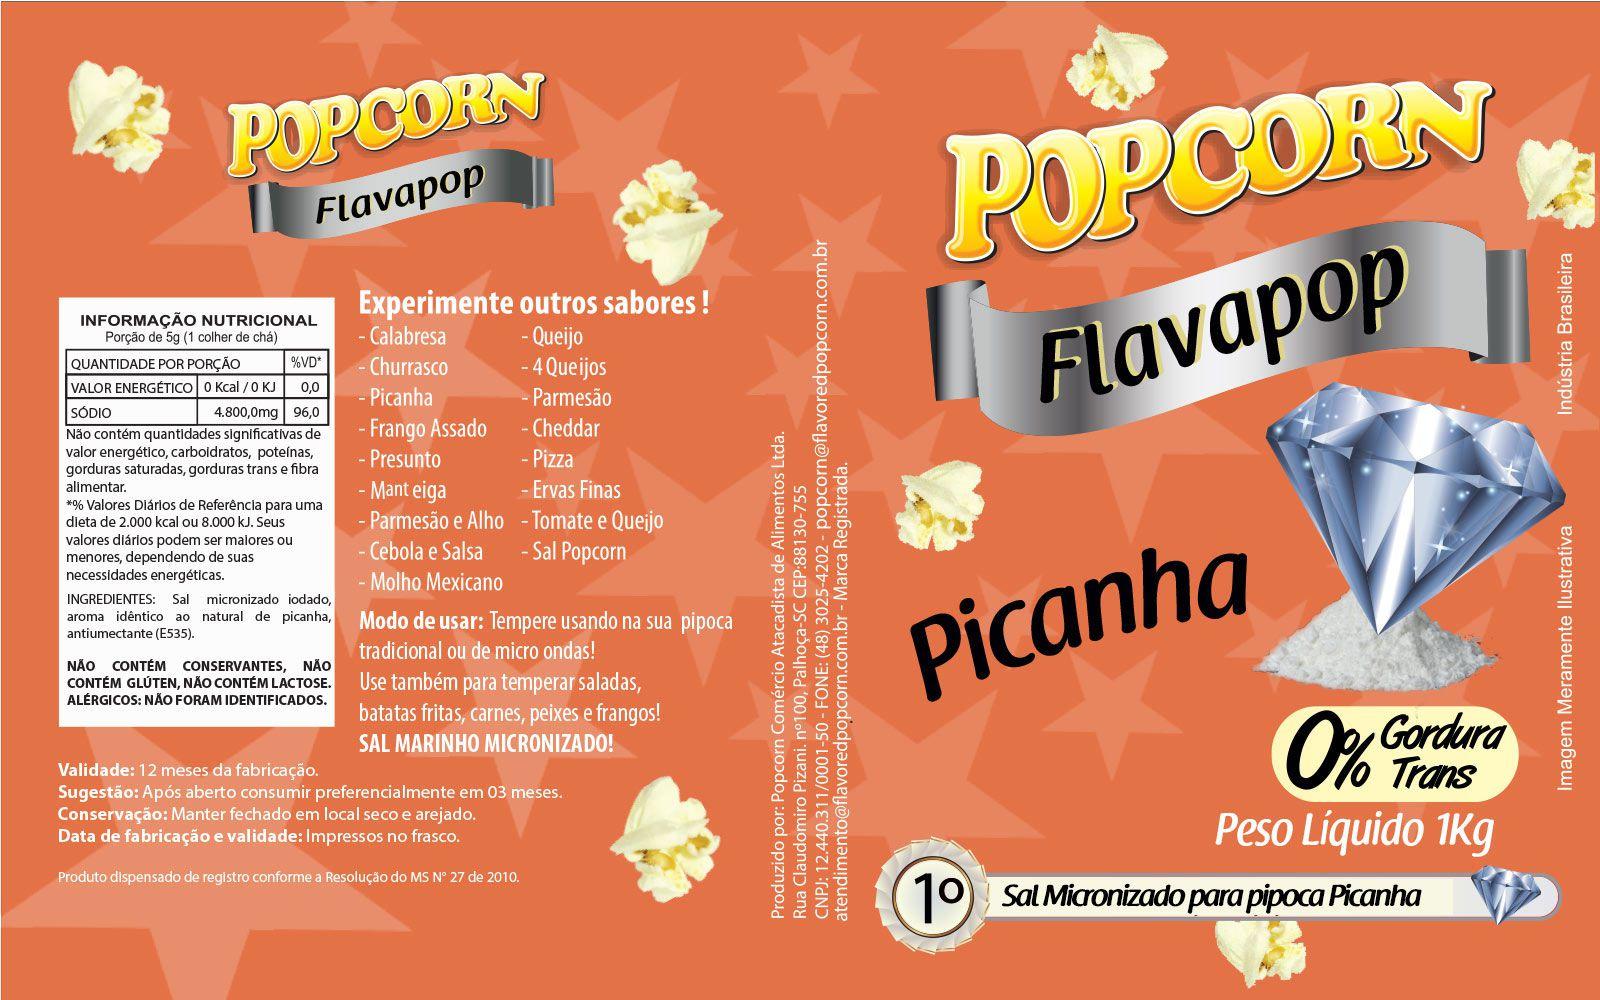 FLAVAPOP - Original de cinema -  Picanha - Micronizado Popcorn  - Pct 1kg